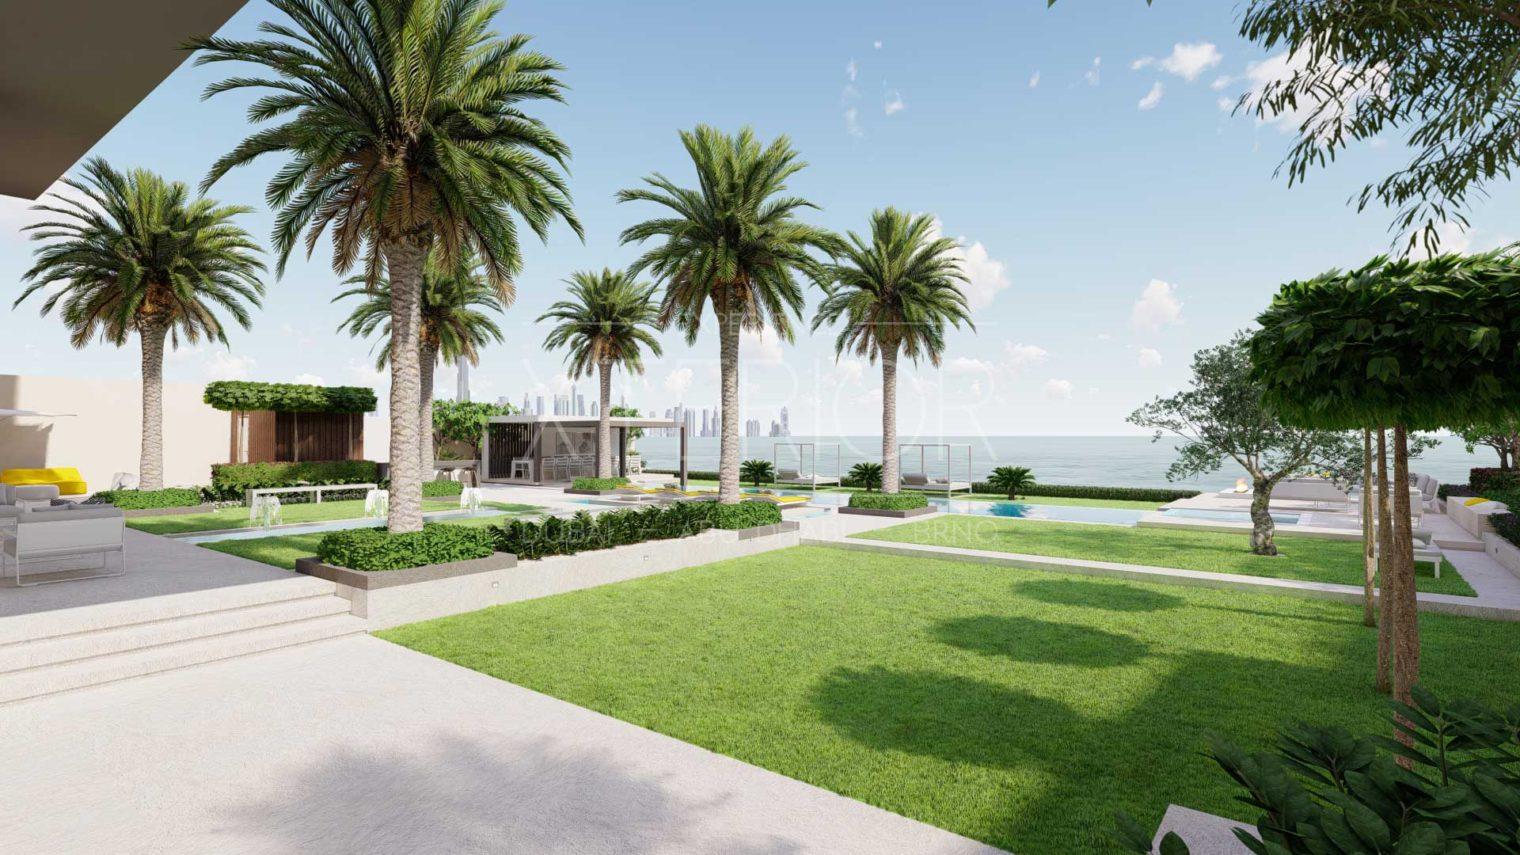 BVLGARI RESIDENCES Outdoor-Landscape-Design-Dubai